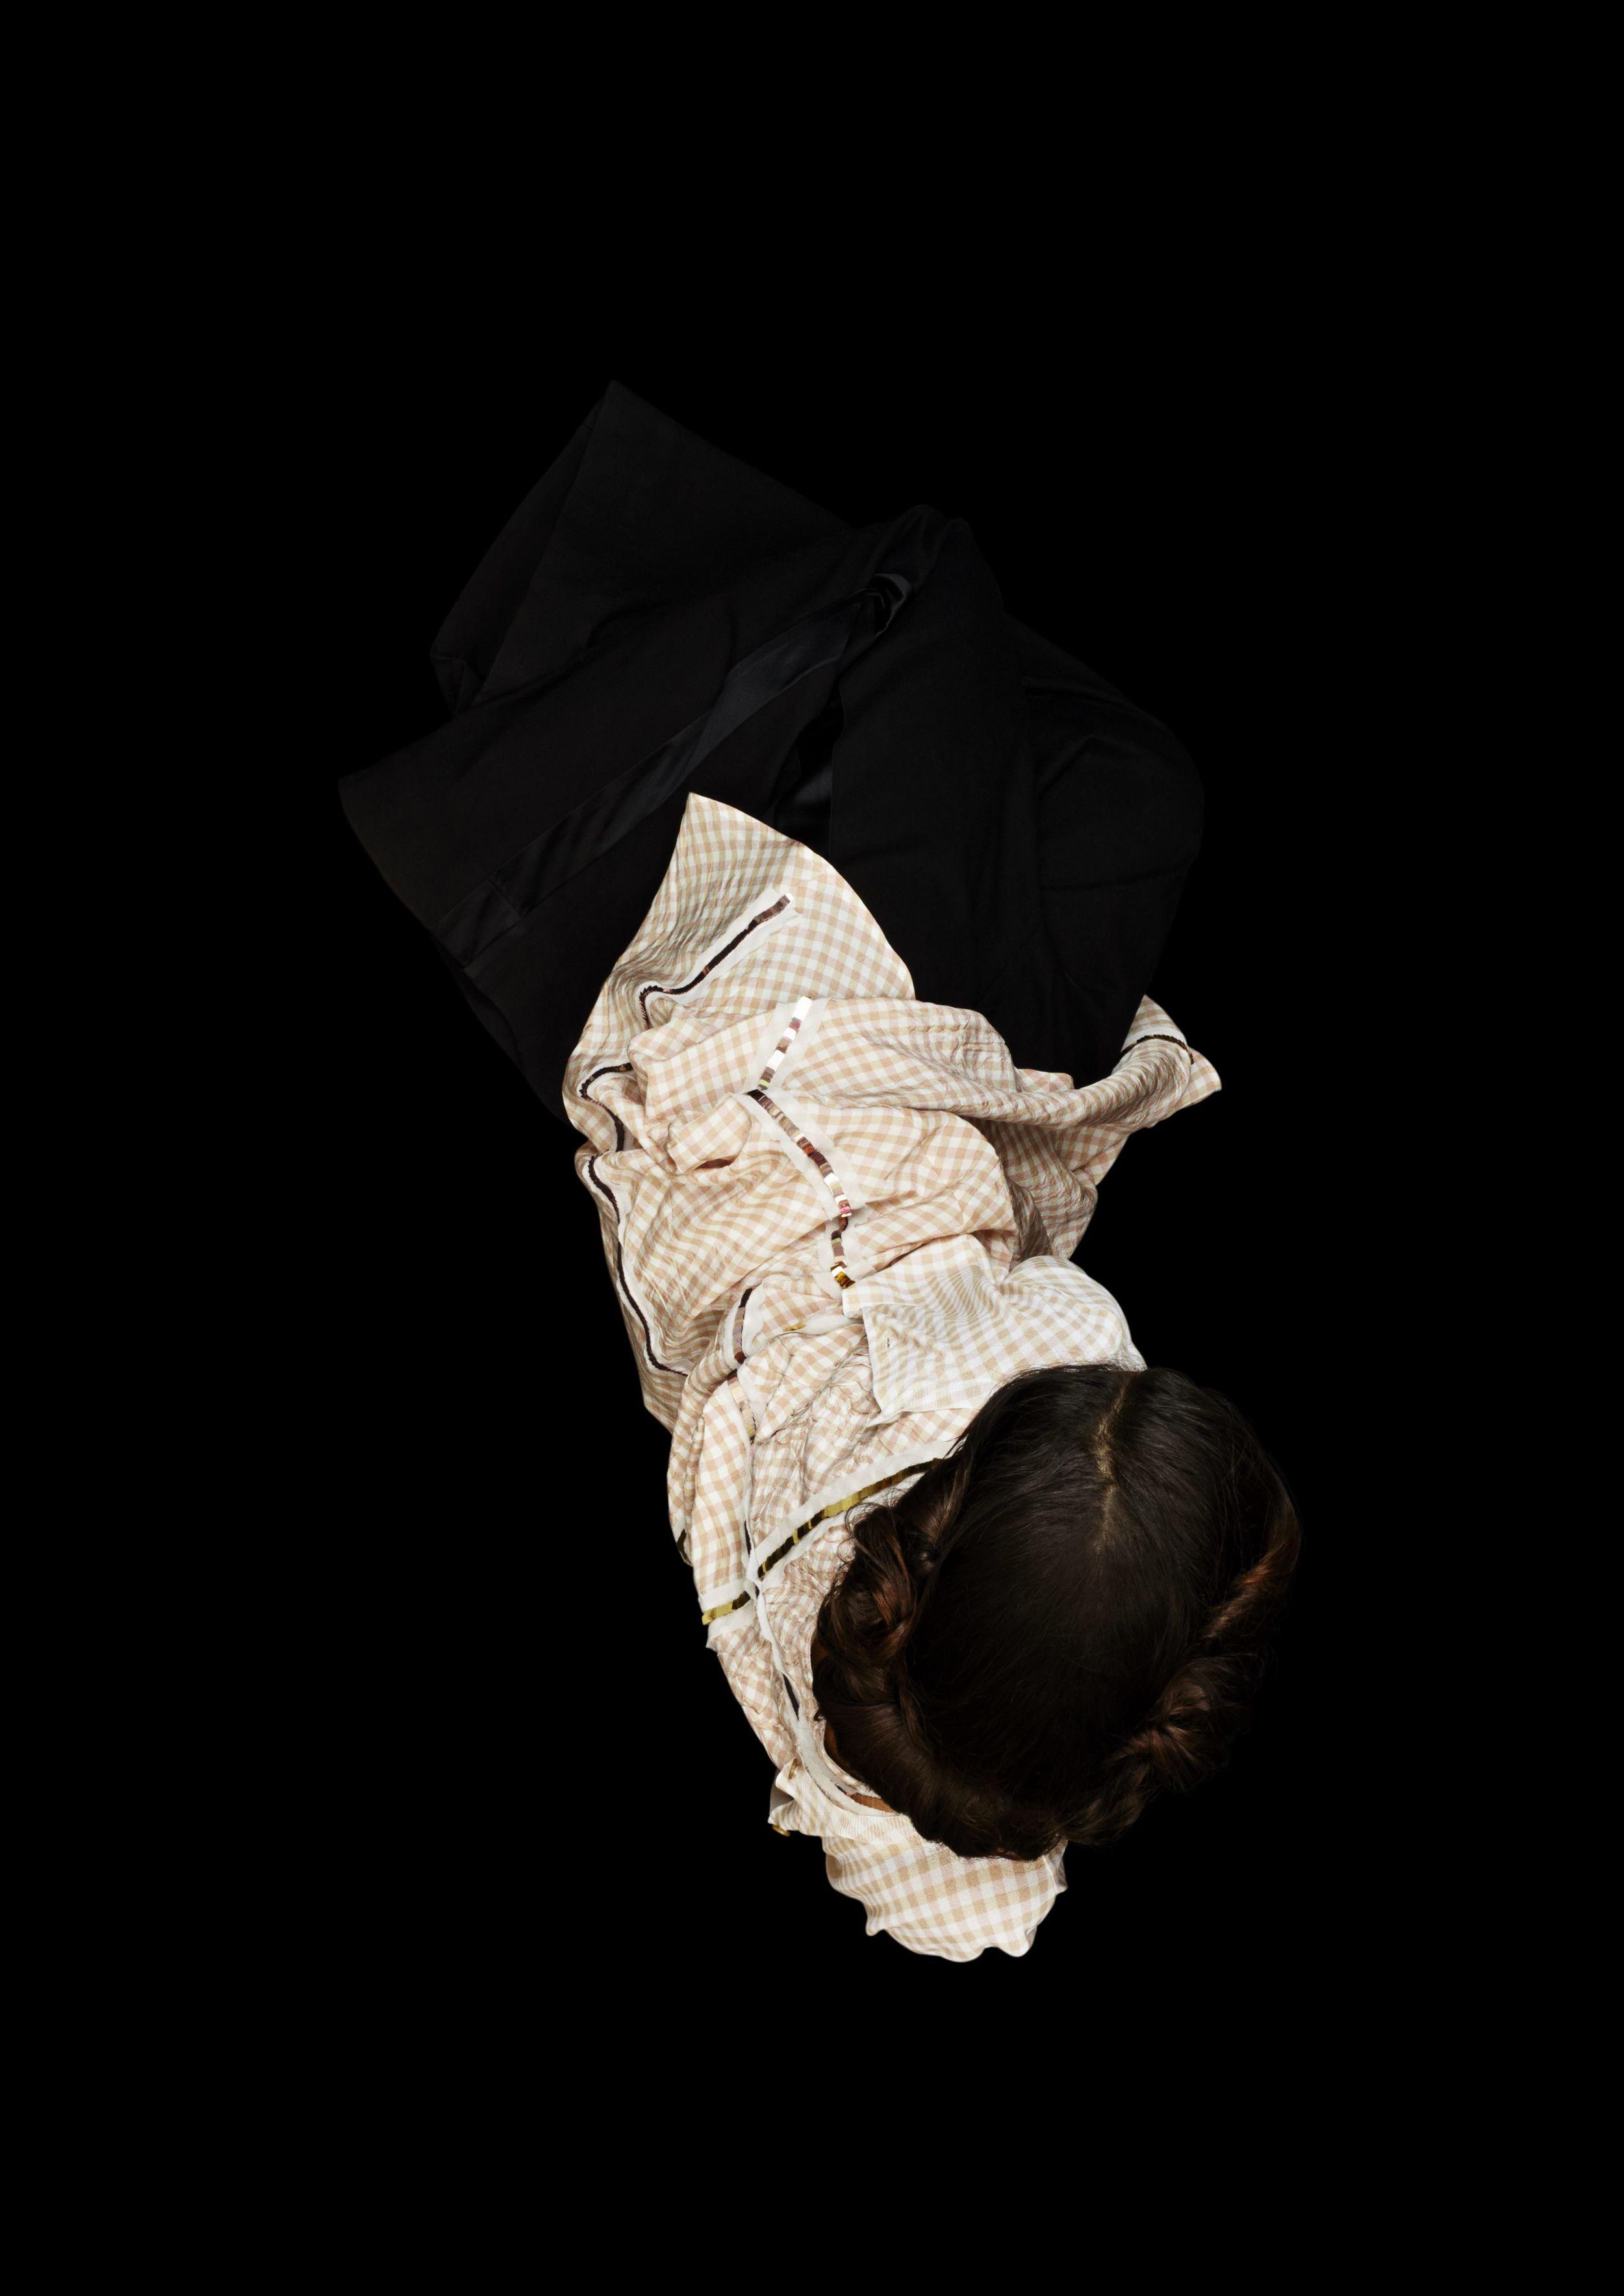 Gingham check cardigan and matching dress  BOTTEGA VENETA,  black wool pants  MM6 MAISON MARTIN MARGIELA.